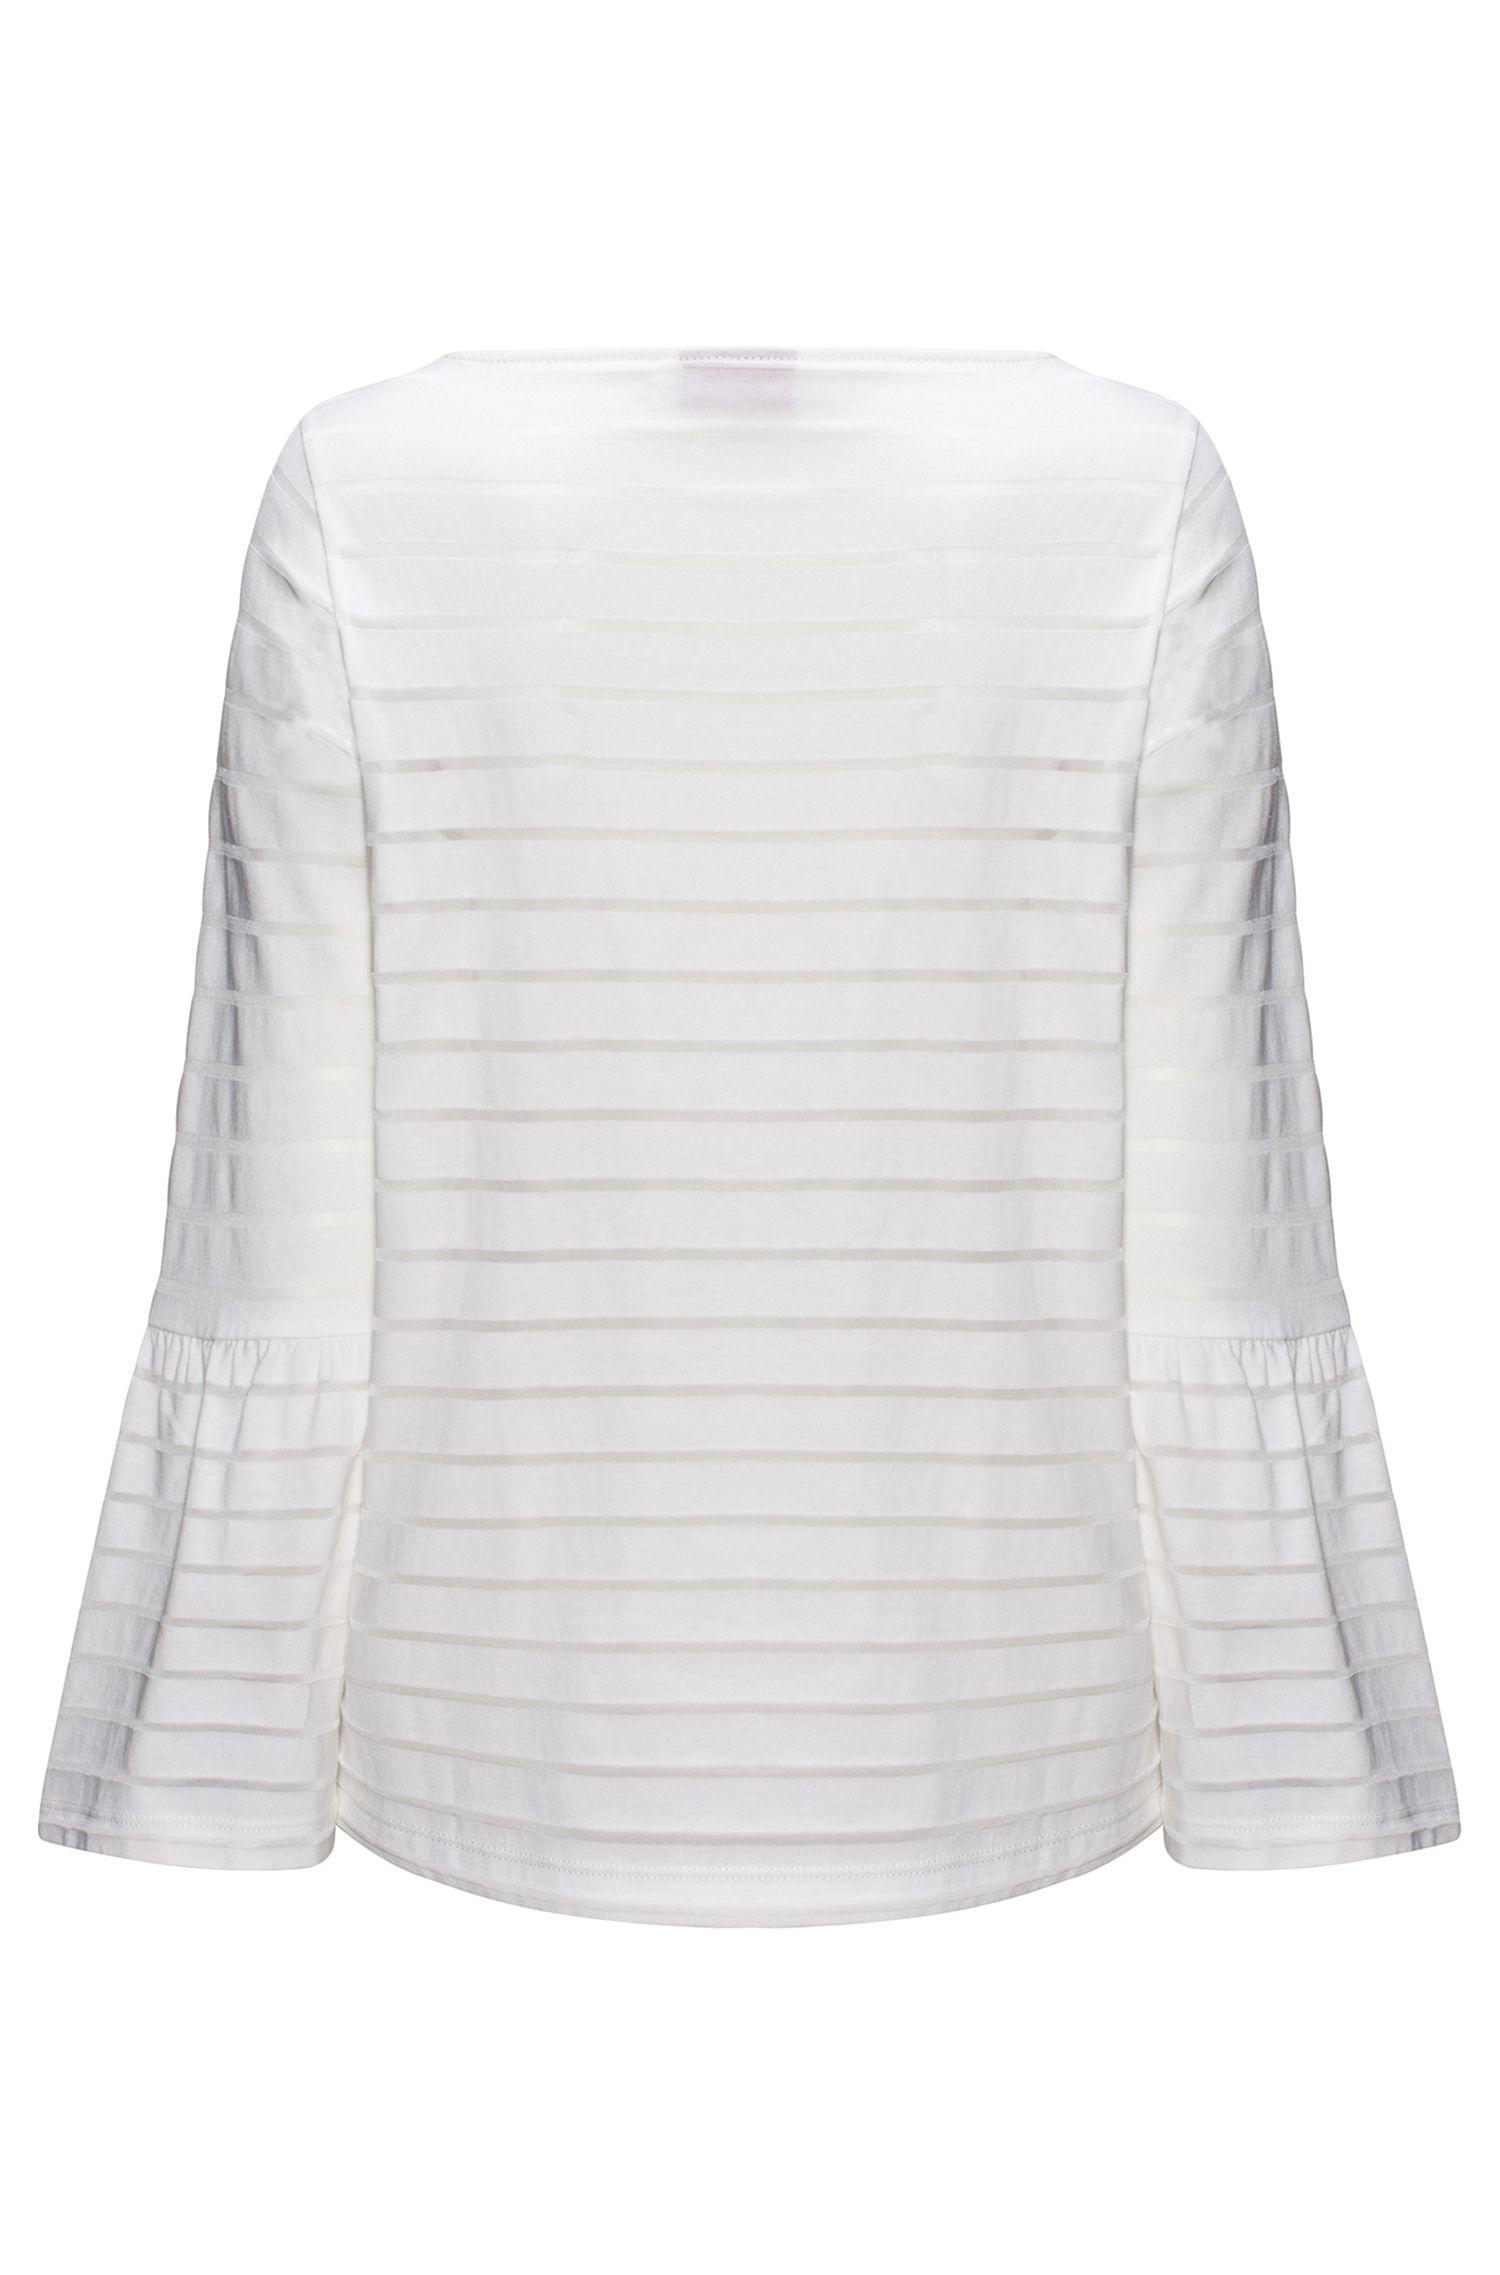 Cotton-blend T-shirt with tonal horizontal stripe